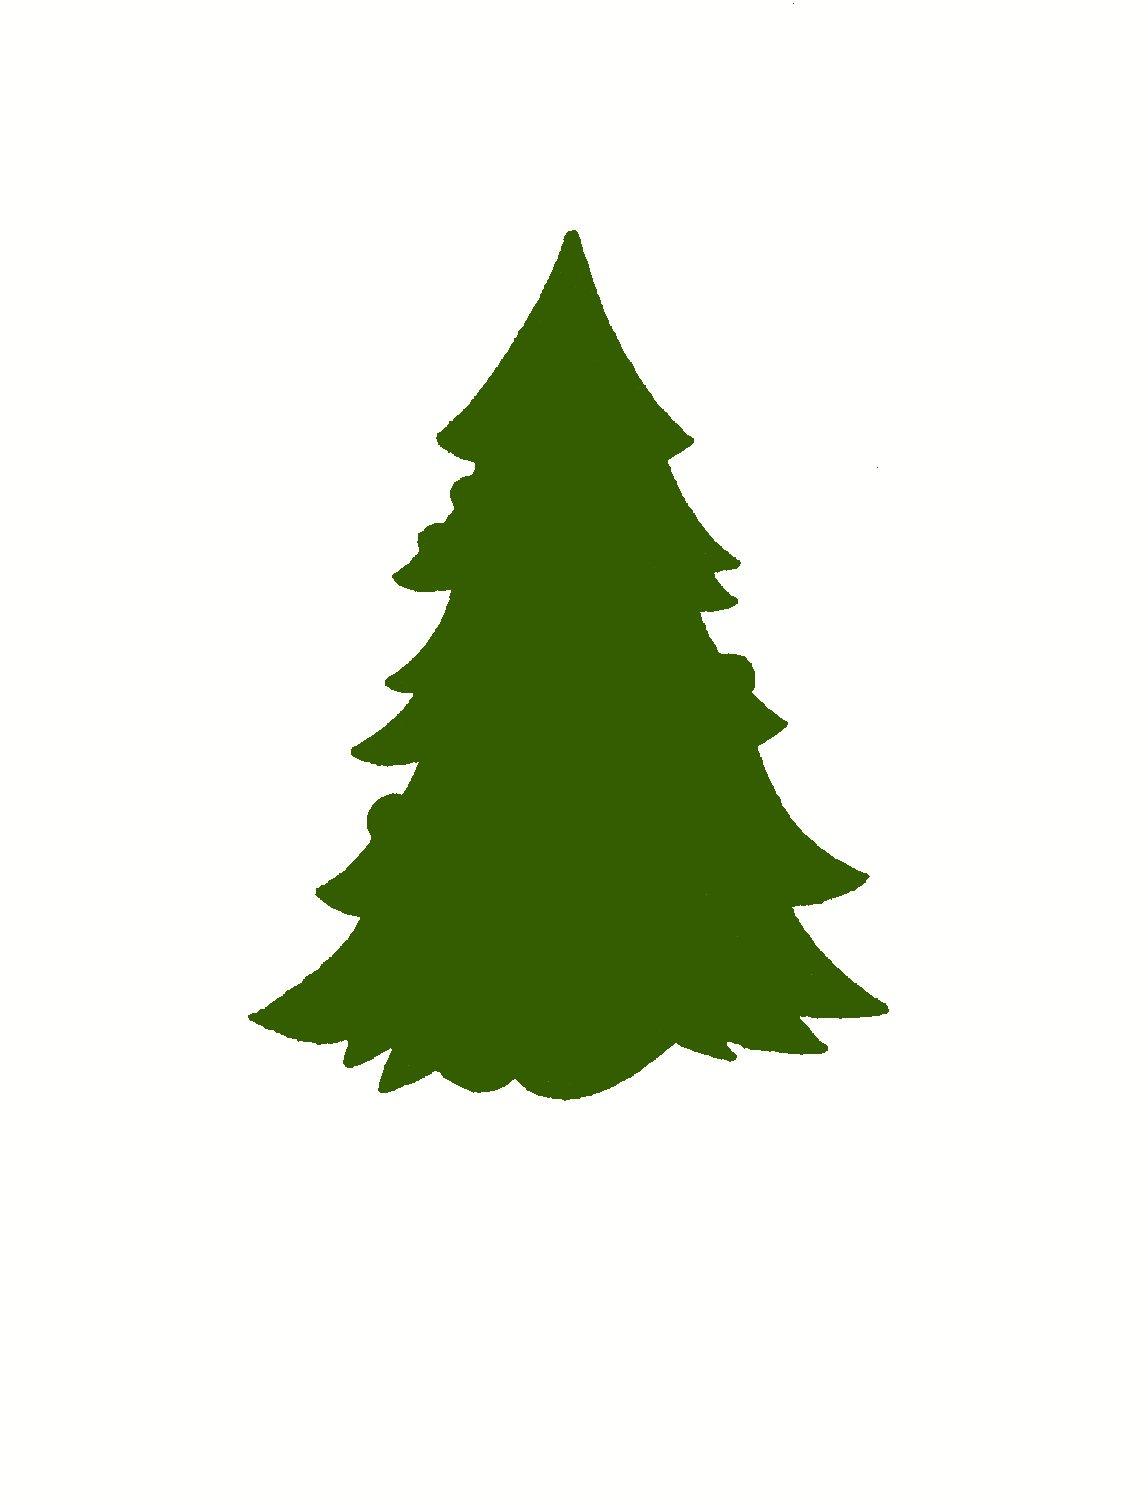 1148x1505 Pine Tree Silhouette Clipart